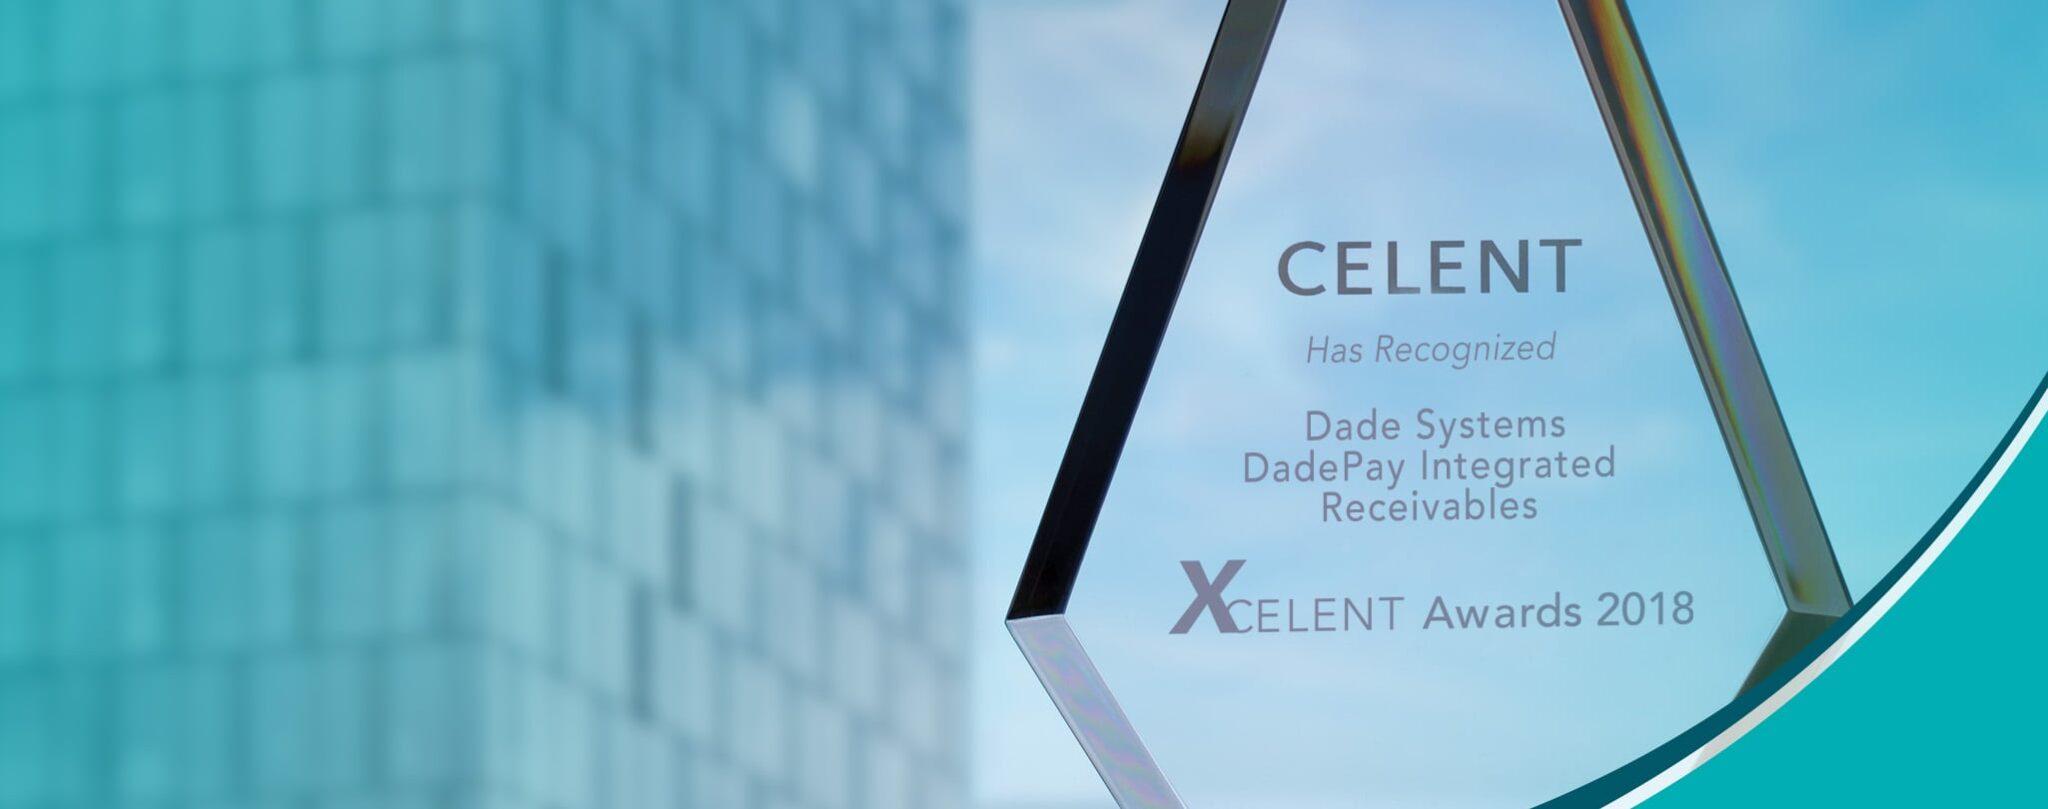 XCELENT AWARD 2018